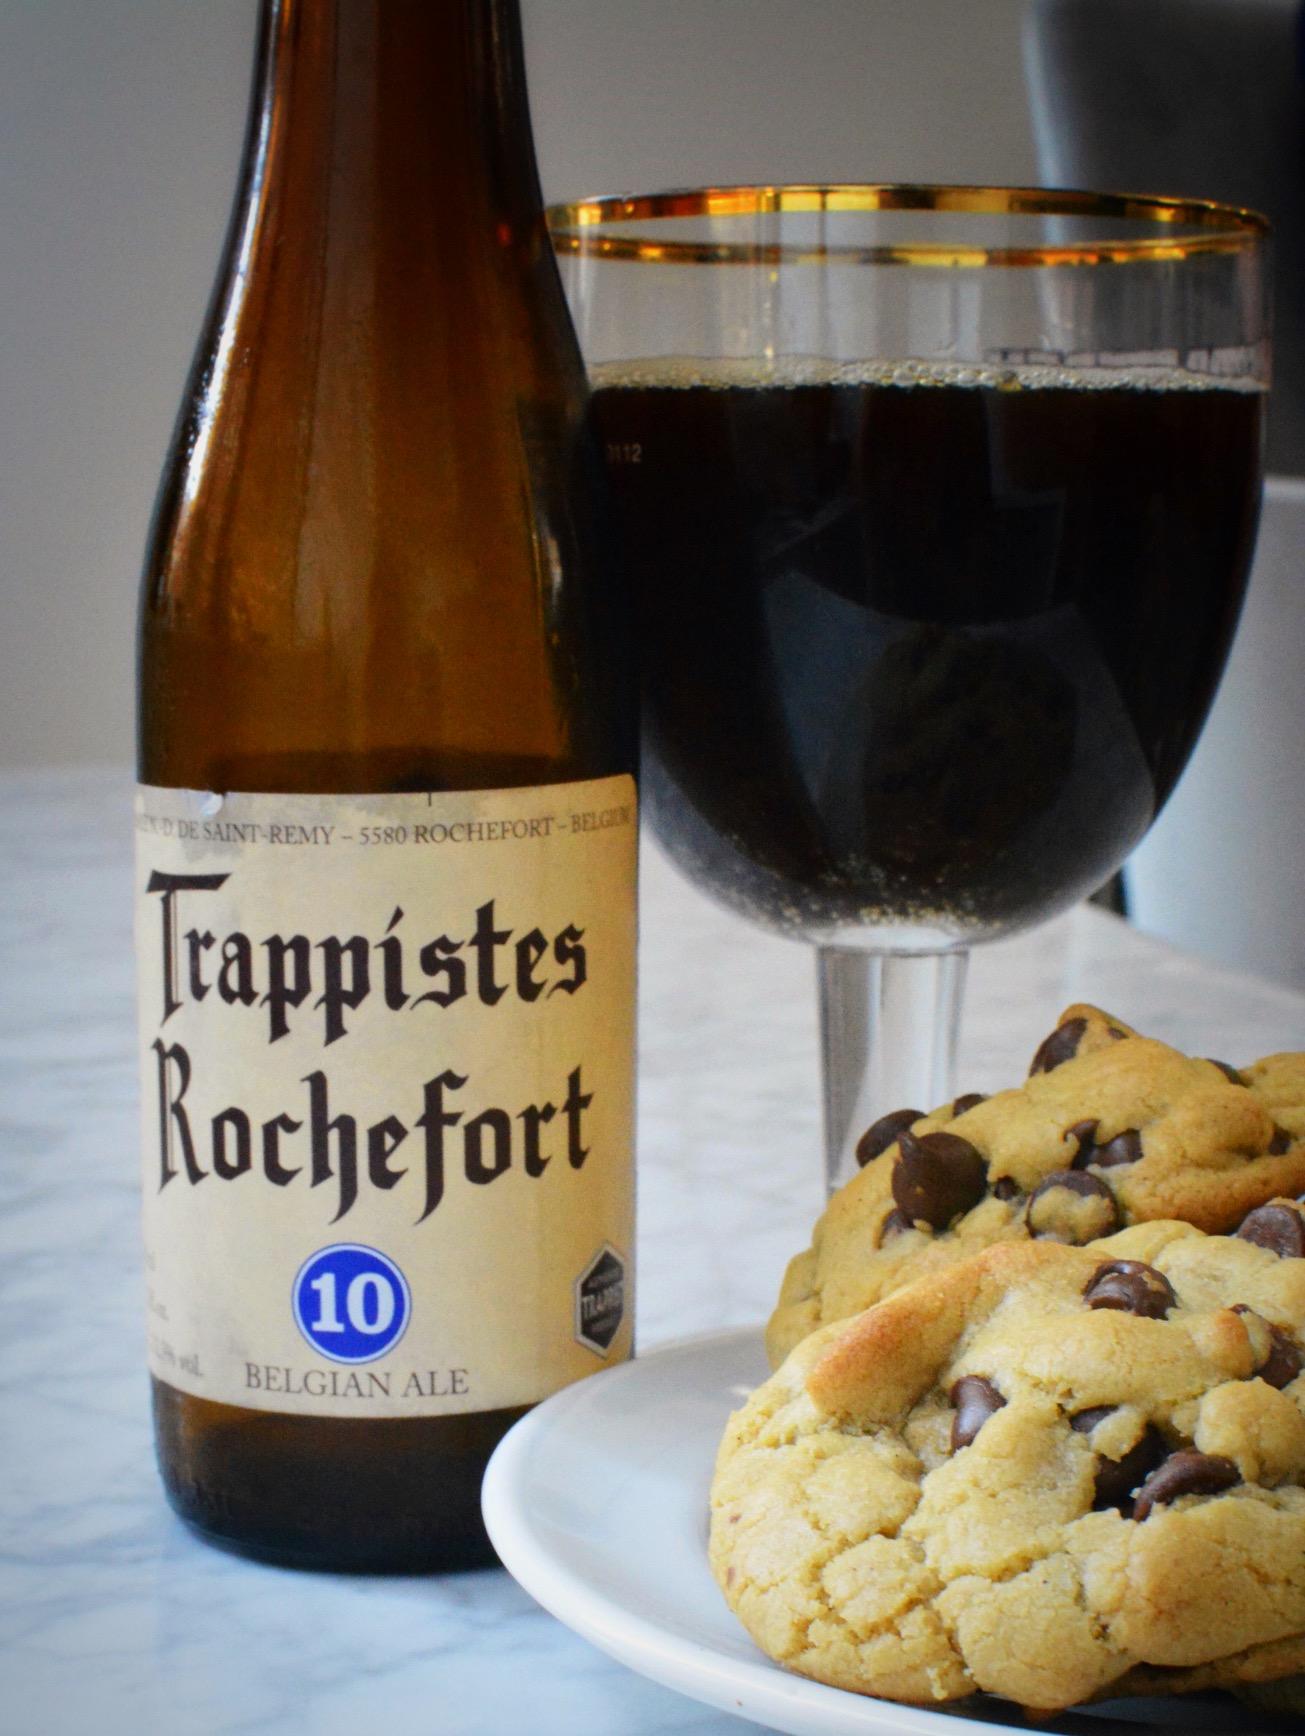 Trappistes-Rochefort-chocolate-cookie-pair.jpg